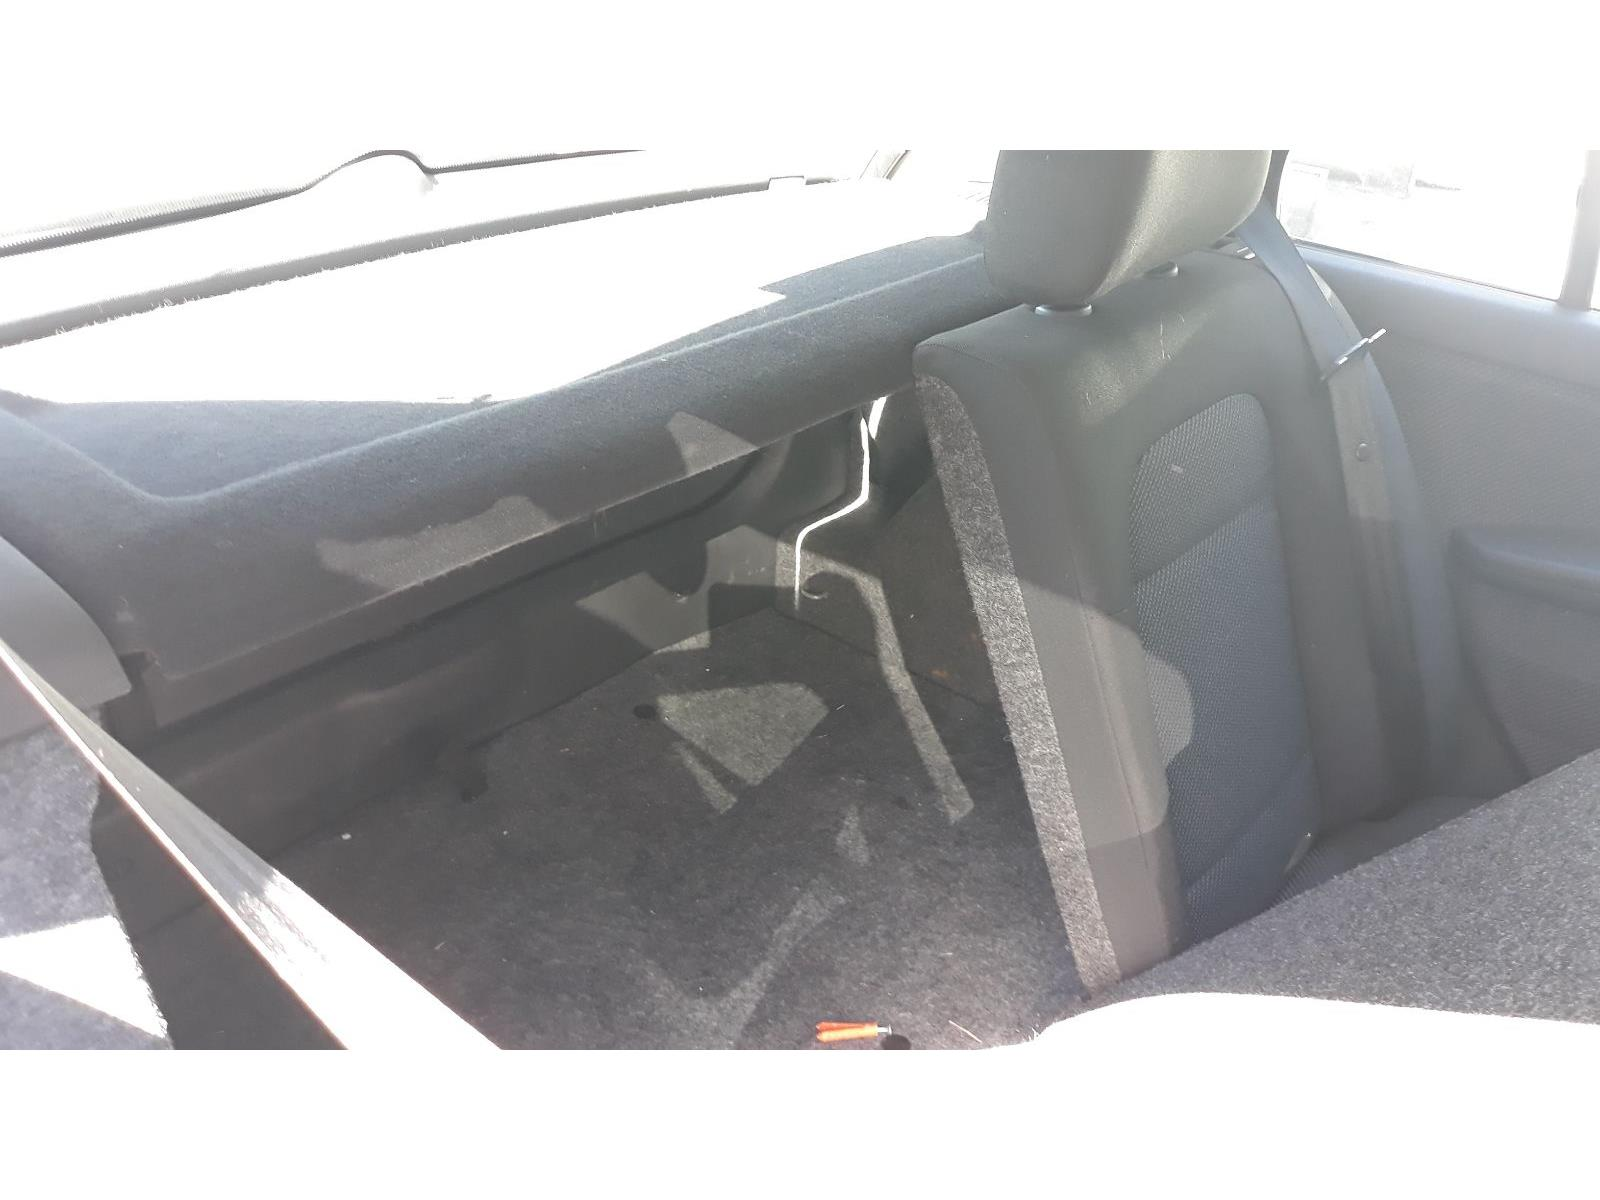 2006 Skoda Fabia 2000 To 2007 Ambiente Tdi 19cc Manual Diesel Grey Fuse Box On A 273 Parts Matching